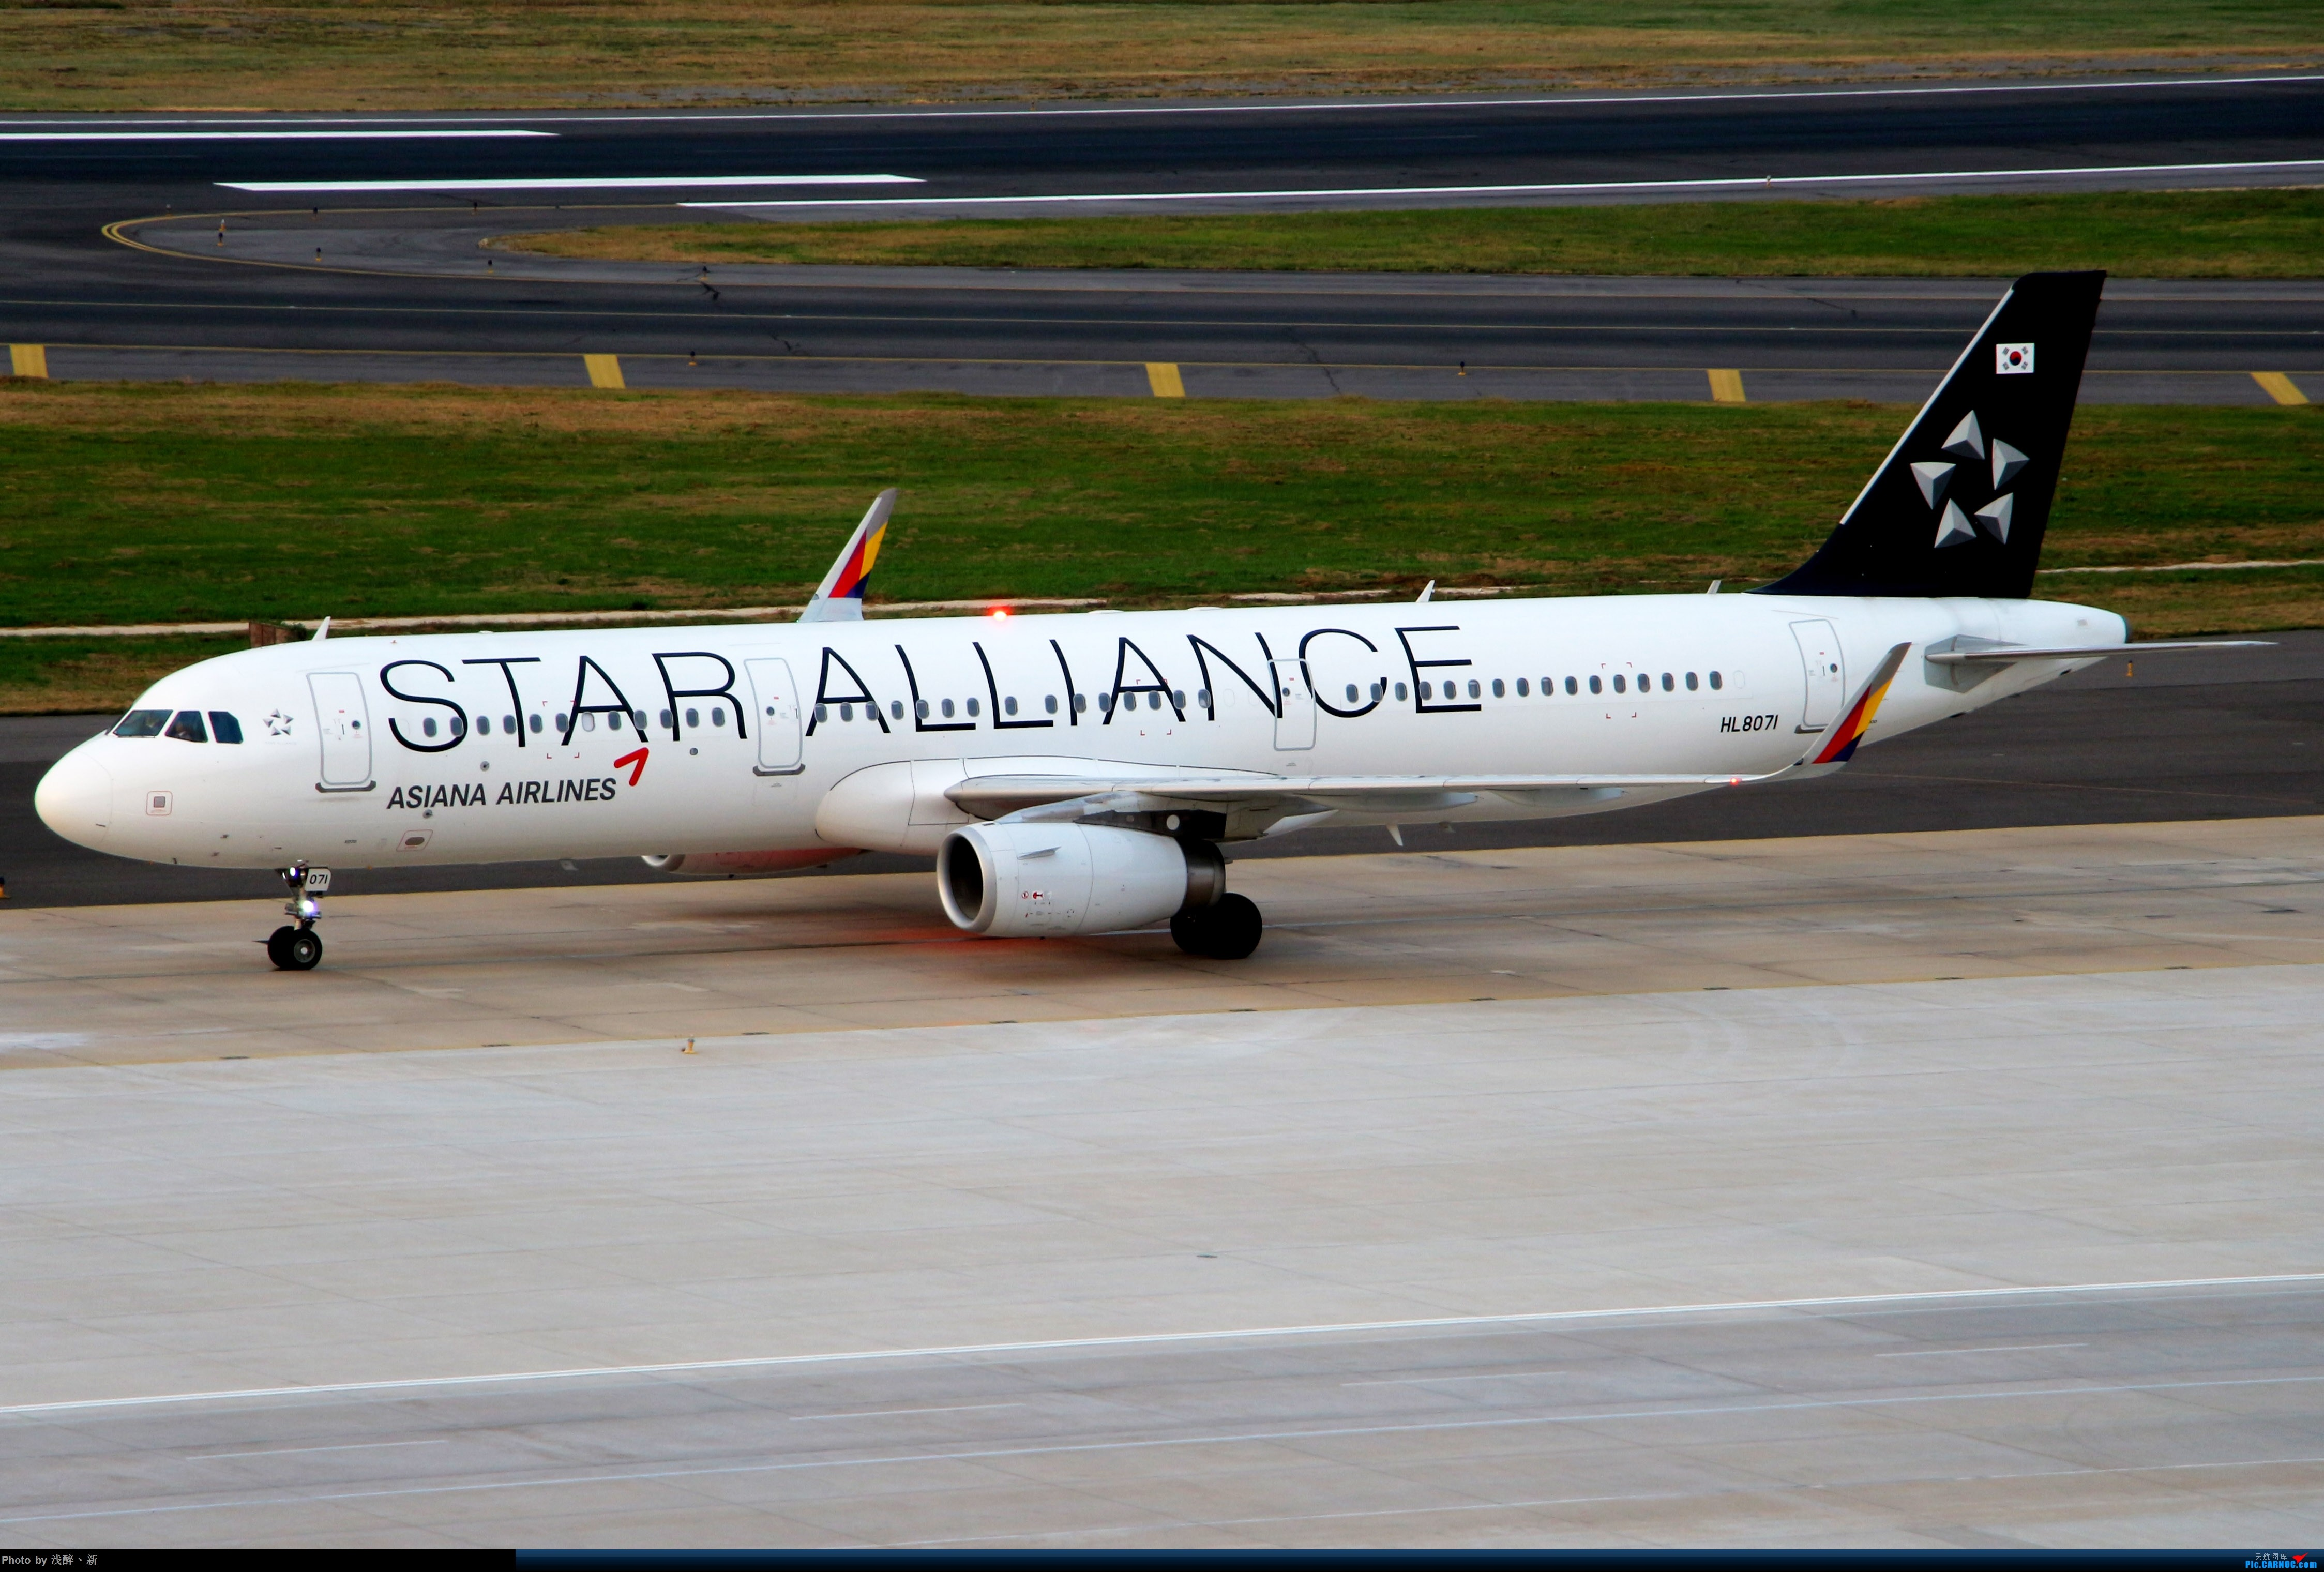 Re:[原创]DLC 9.15 日常杂货 AIRBUS A321 HL8071 中国大连国际机场